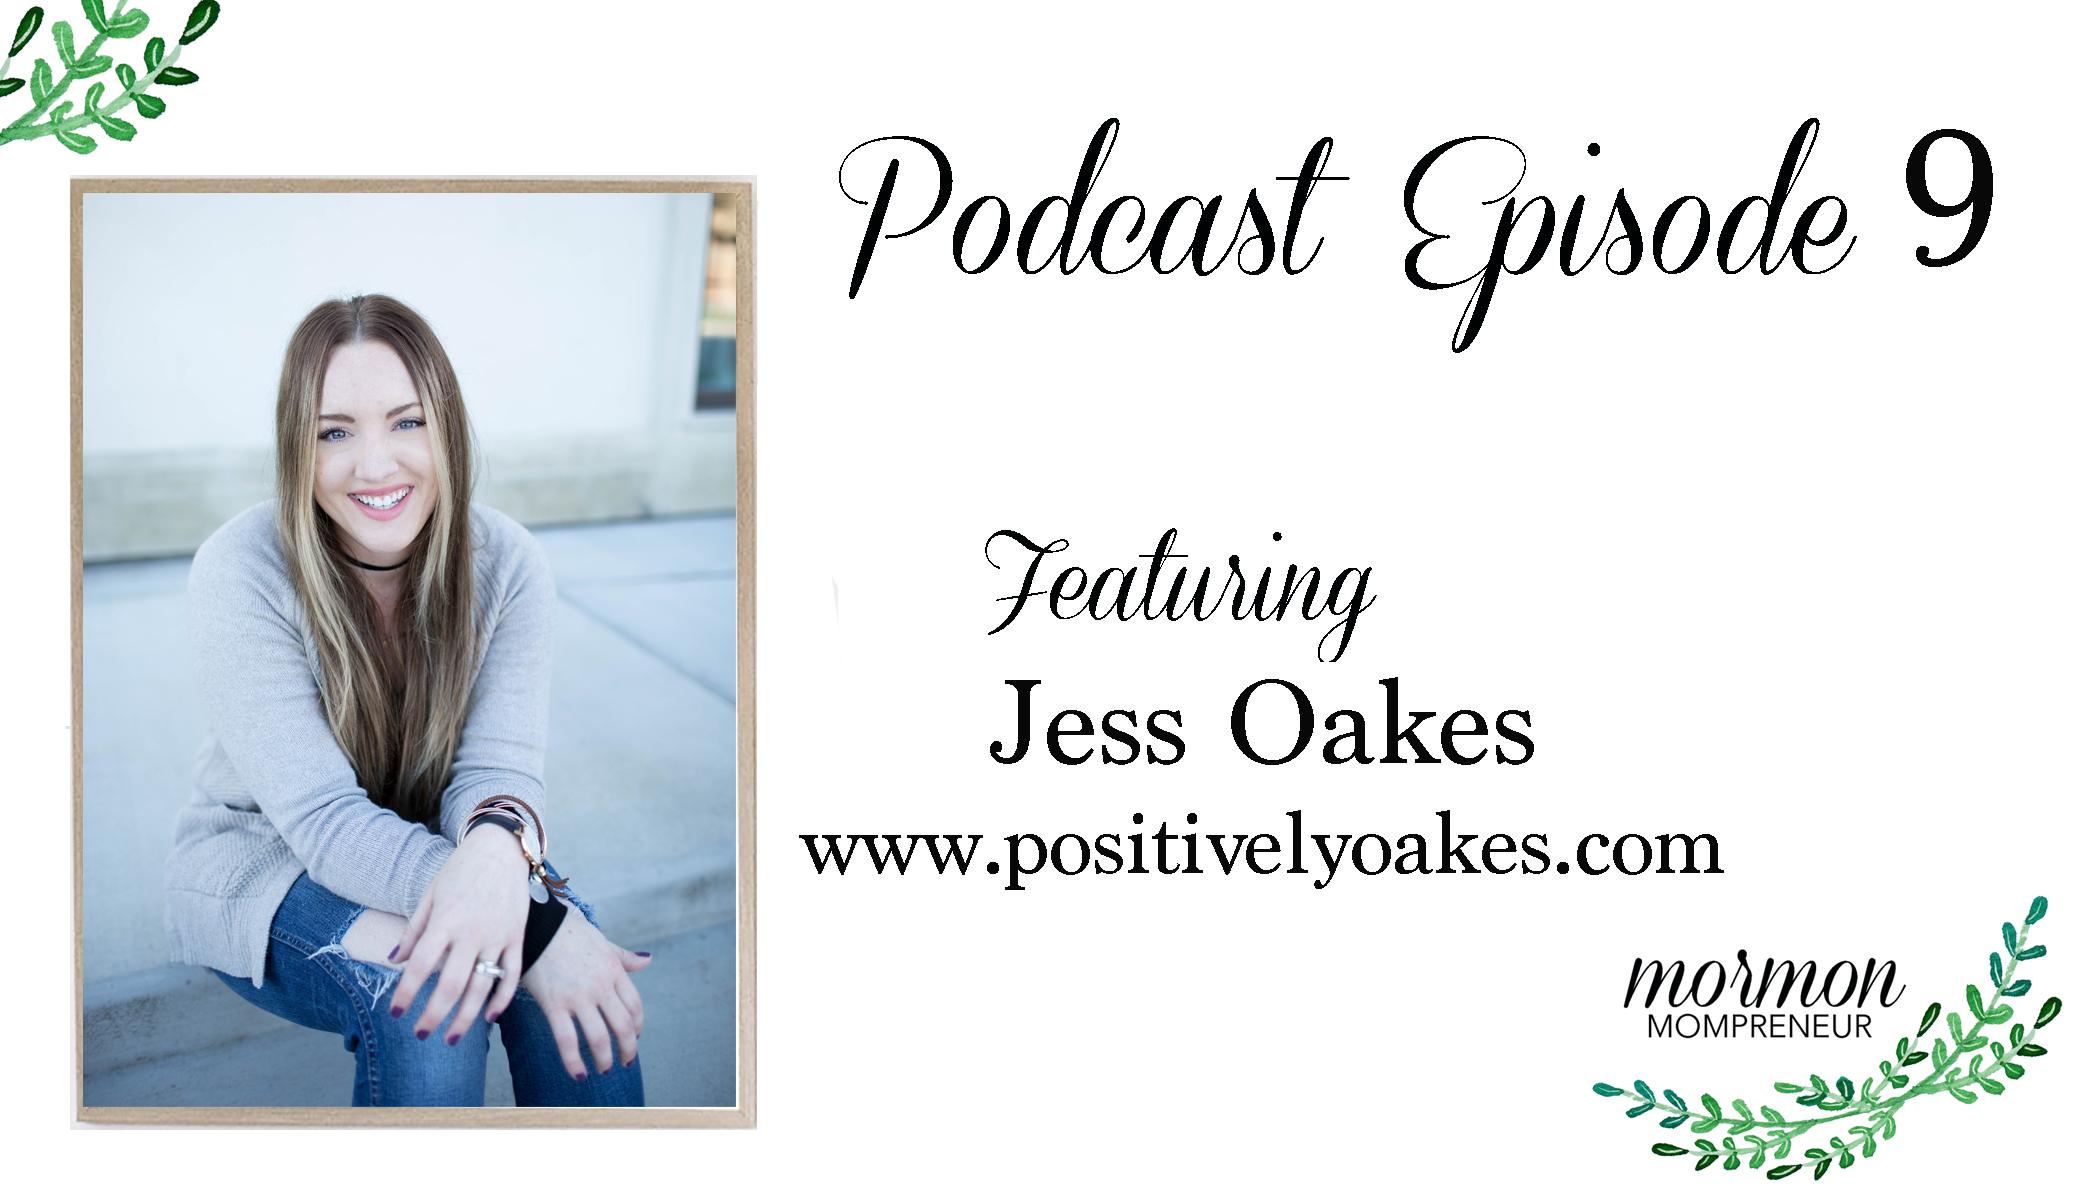 mormon mompreneur podcast episode 9 jess oakes